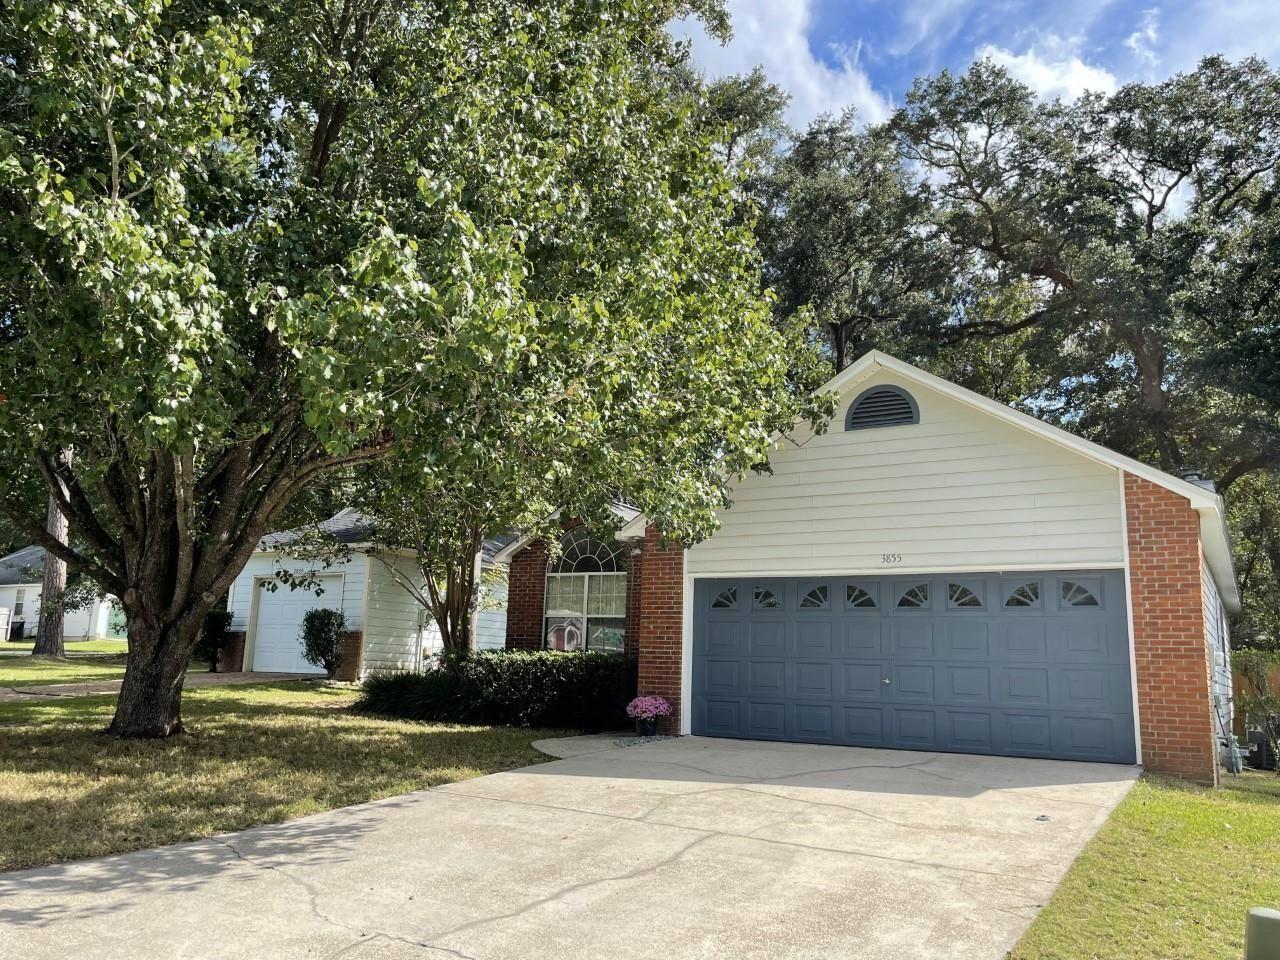 Photo of 3855 McFarlane Drive, TALLAHASSEE, FL 32303 (MLS # 337953)